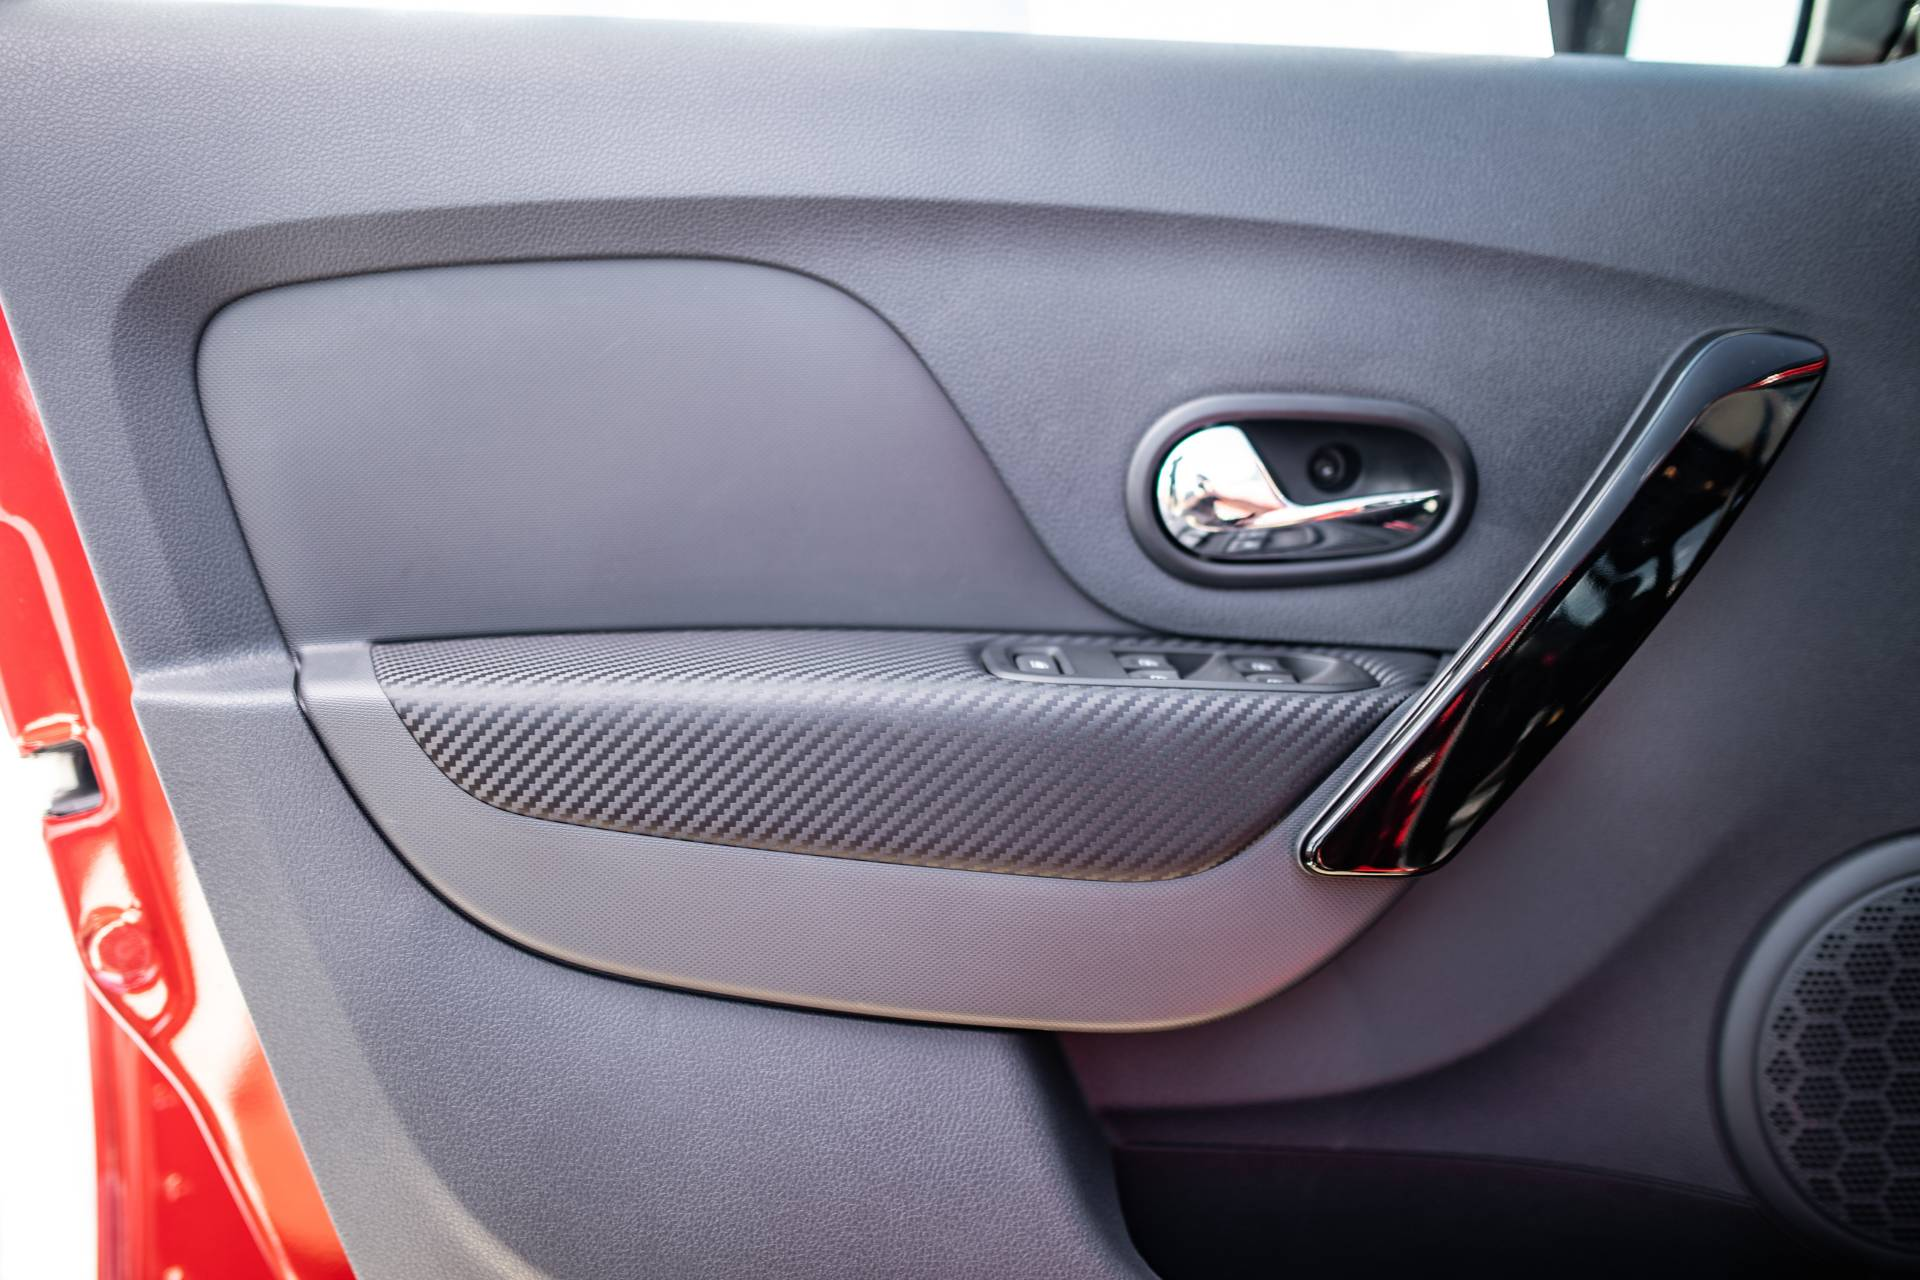 2020_Renault_Sandero_RS_facelift_0030